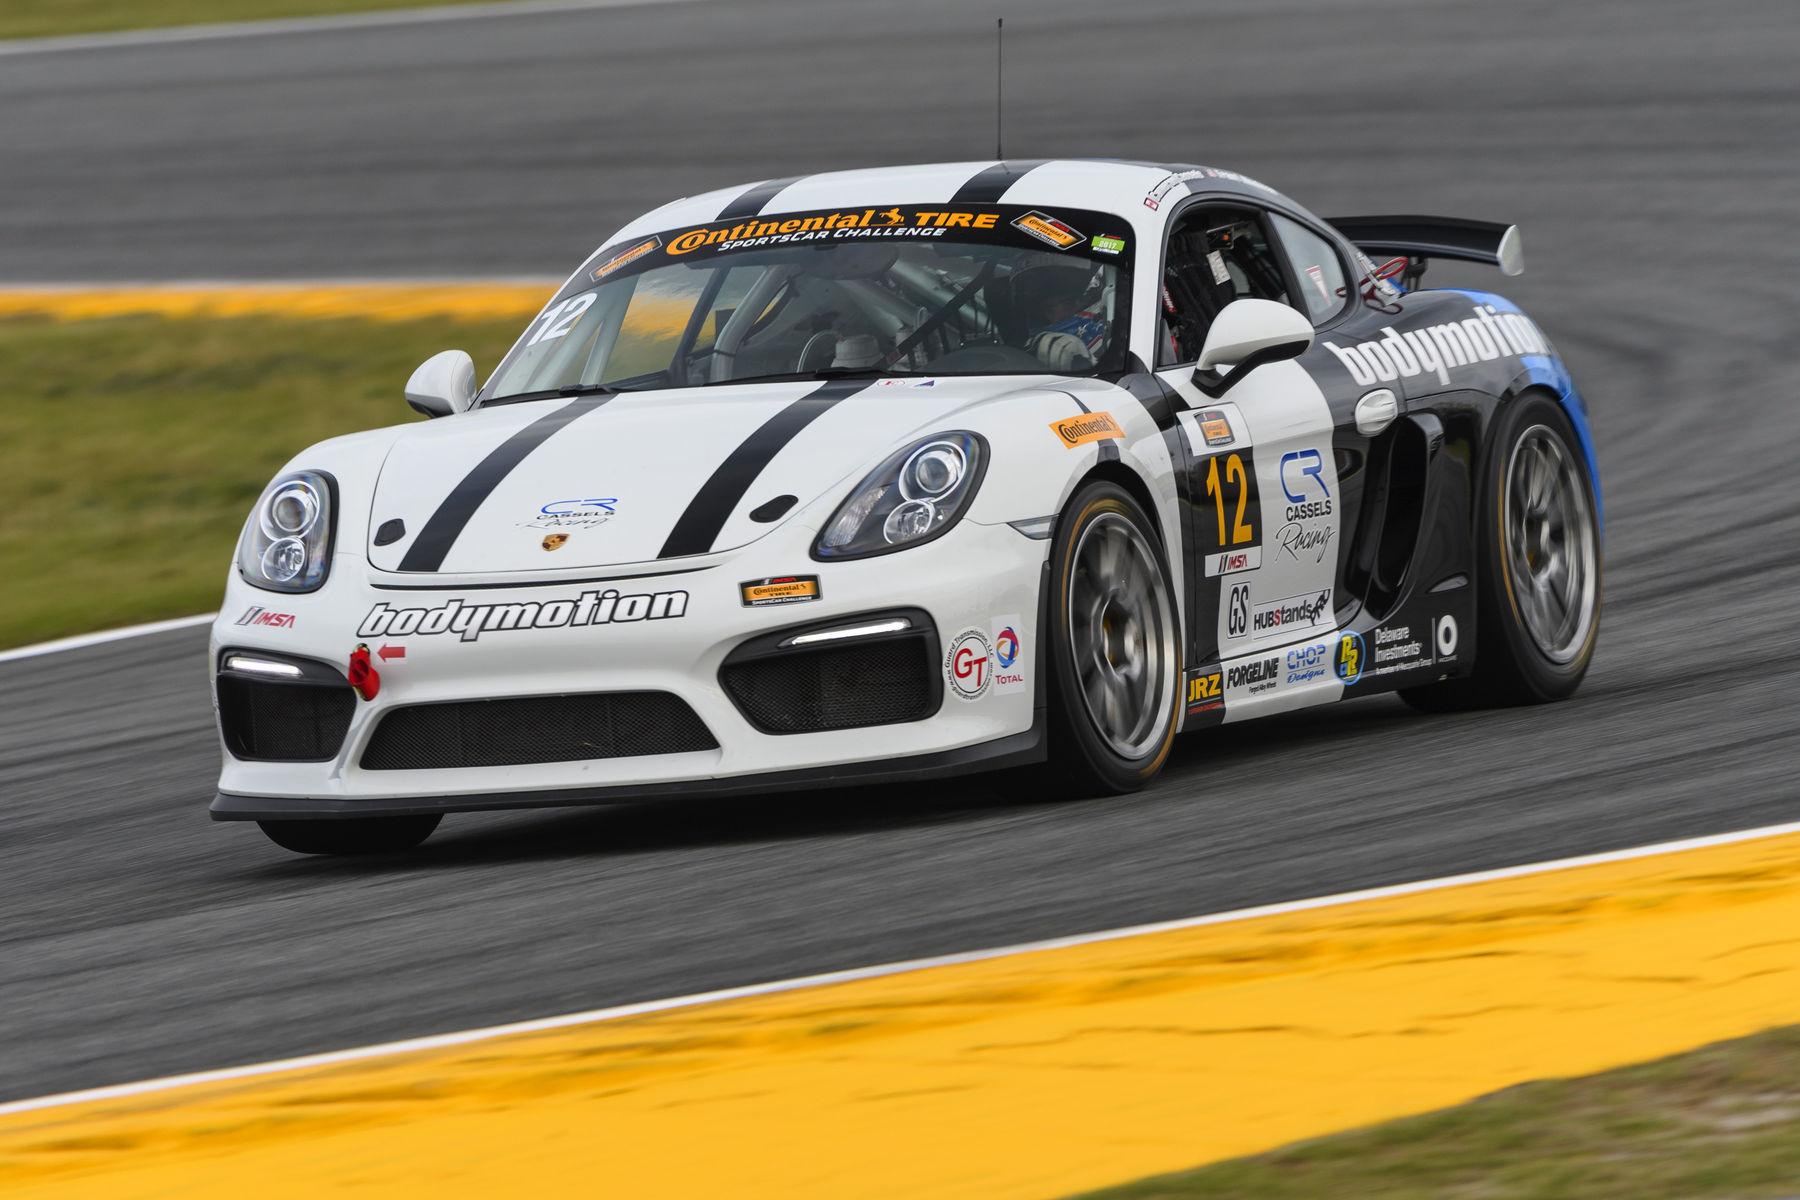 2017 Porsche Cayman | Forgeline-Equipped Porsche Caymans Dominate IMSA CTSC 2017 Season Opener at Daytona